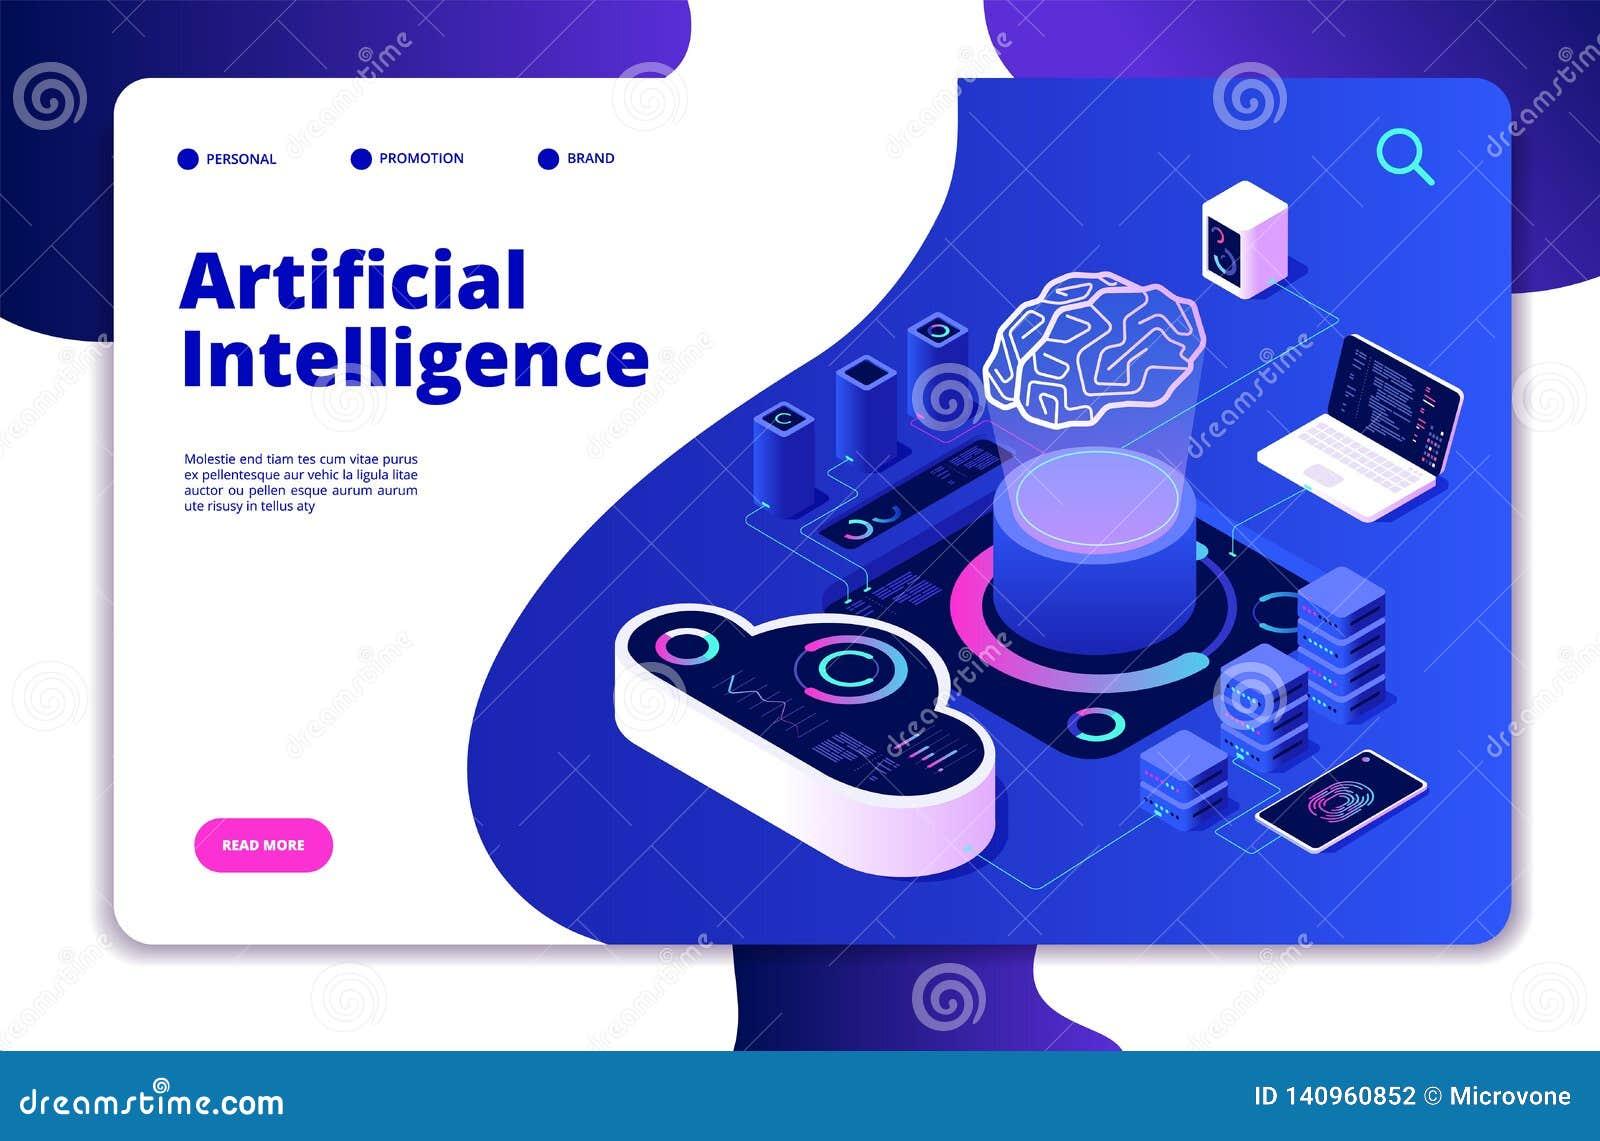 Artificial intelligence landing. Ai smart digital brain networking neural learning intelligent solutions innovations